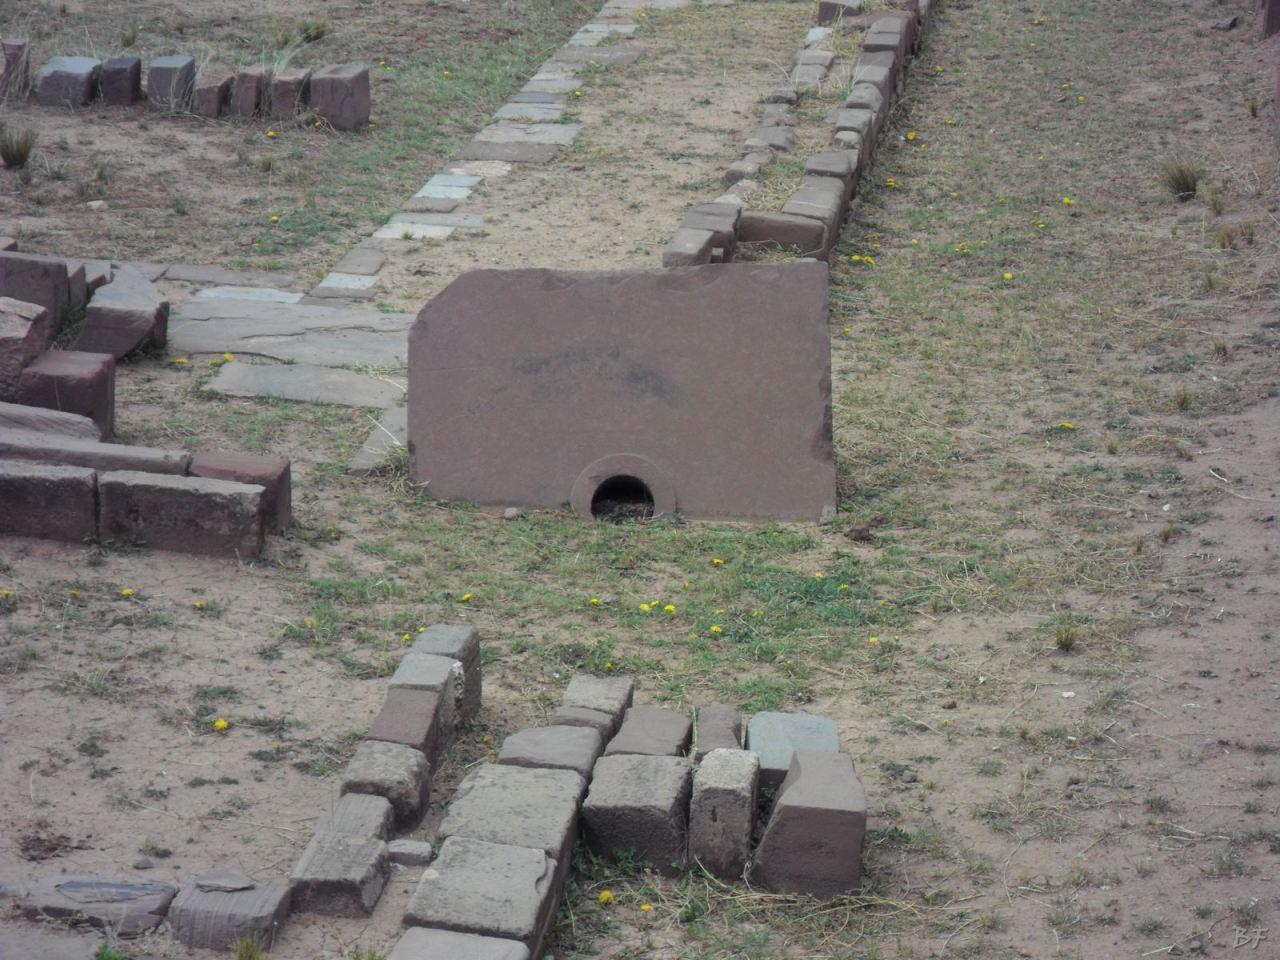 Sito-Megalitico-Piramide-Akapana-Kalasasaya-Menhir-Tiahuanaco-Bolivia-120